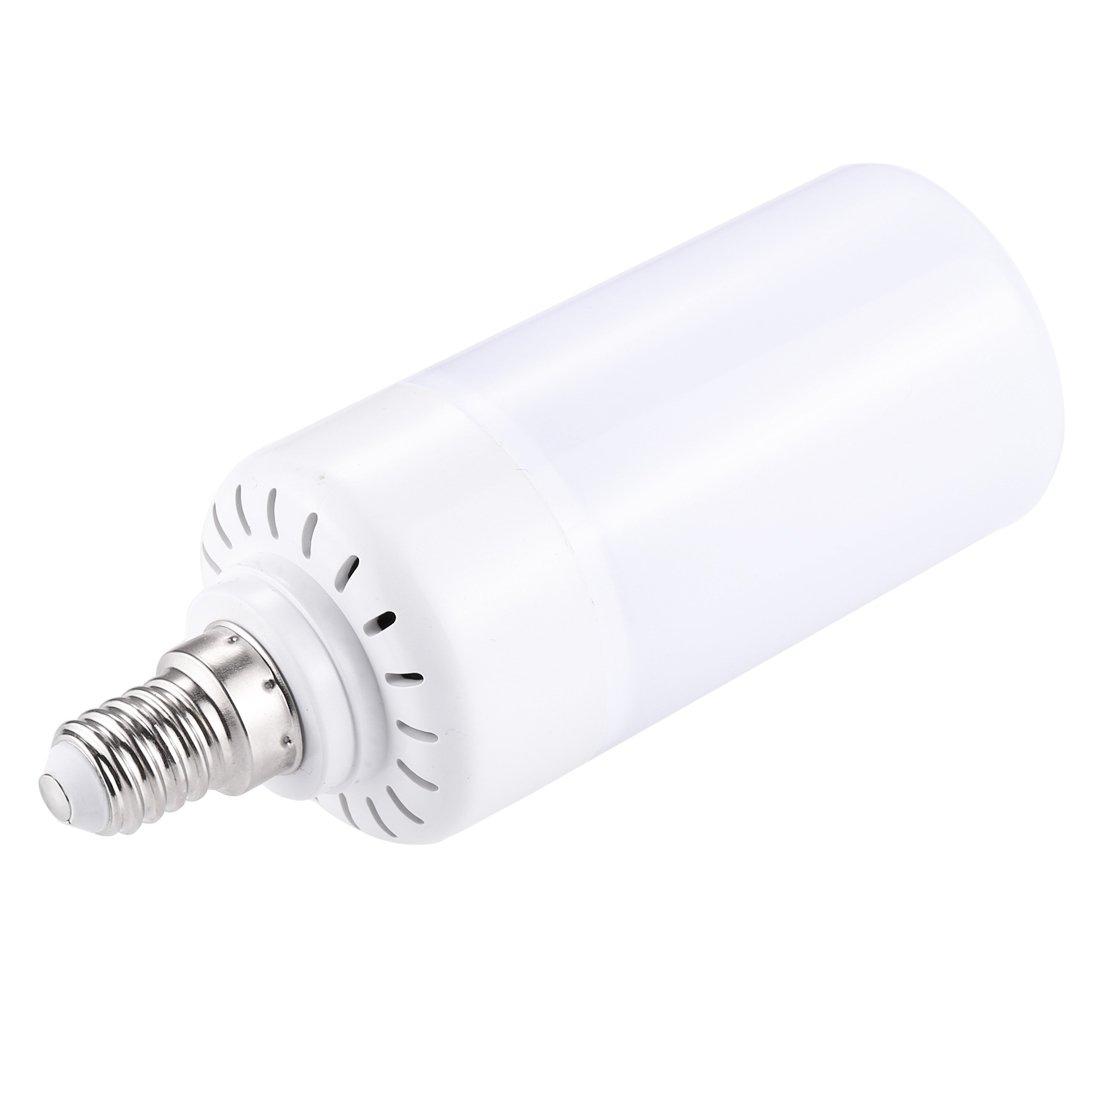 Jasmin FS LED bulb E14 6W 99 LEDs SMD 2835 146 LM 2 Modes Warm White Light Flicker Flame Corn Light Bulb, AC 85-265V LED Light Corn light